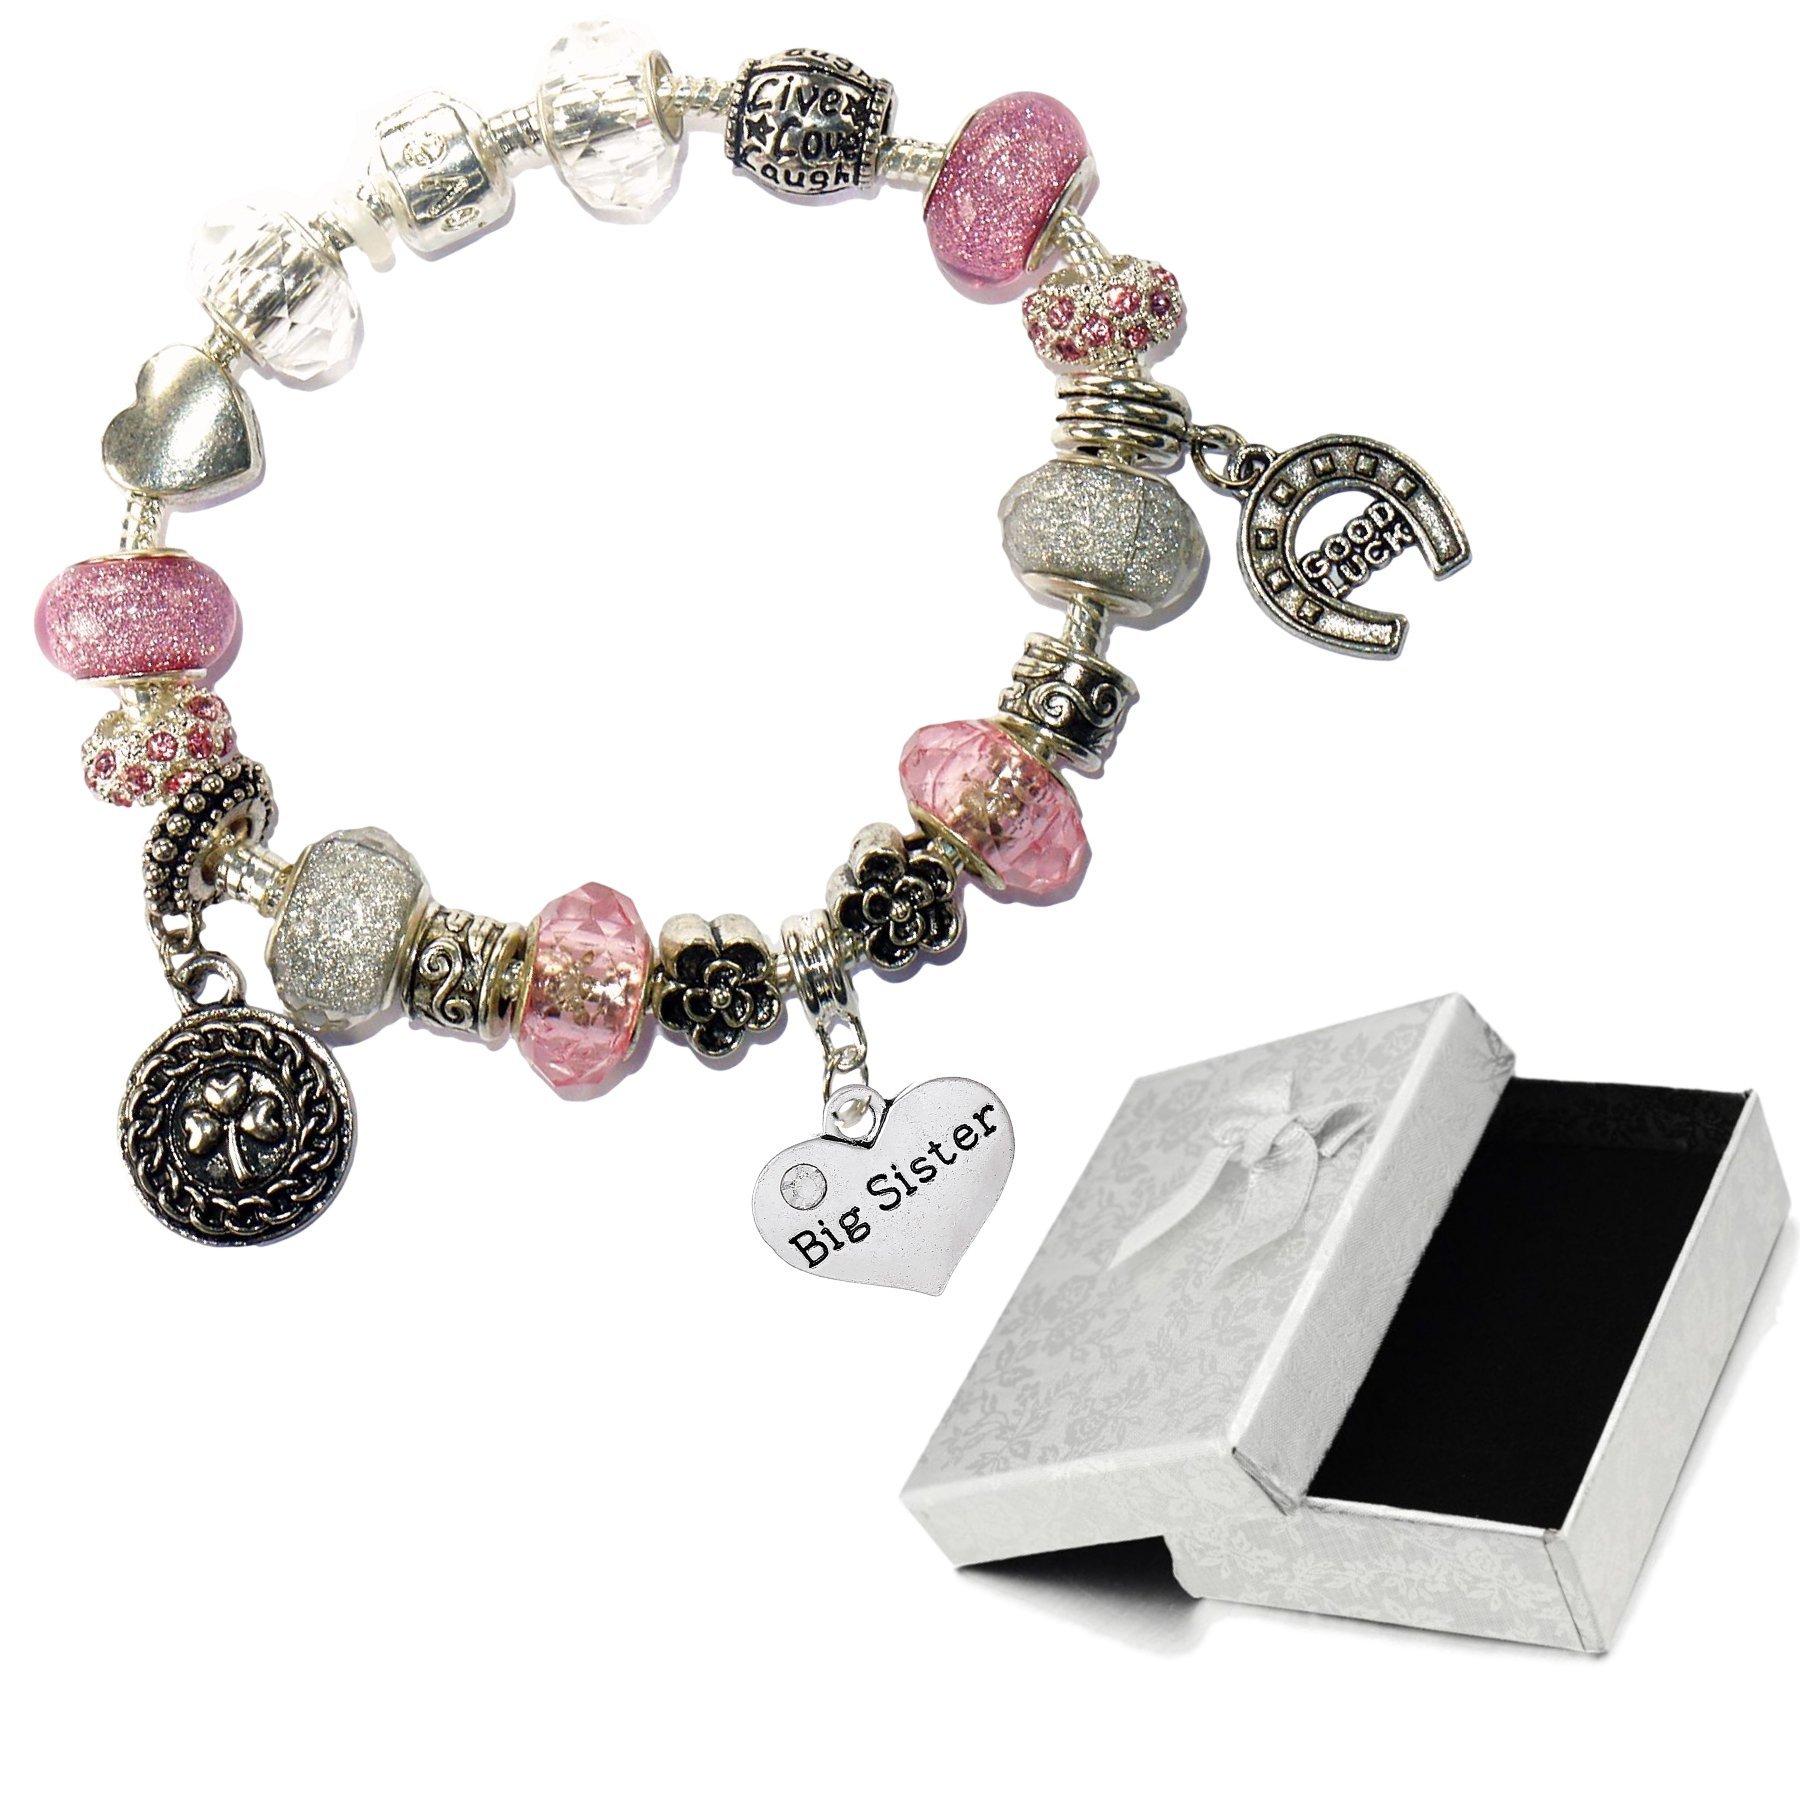 Charm Buddy Big Sister Pink Silver Crystal Good Luck Pandora Style Bracelet With Charms Gift Box